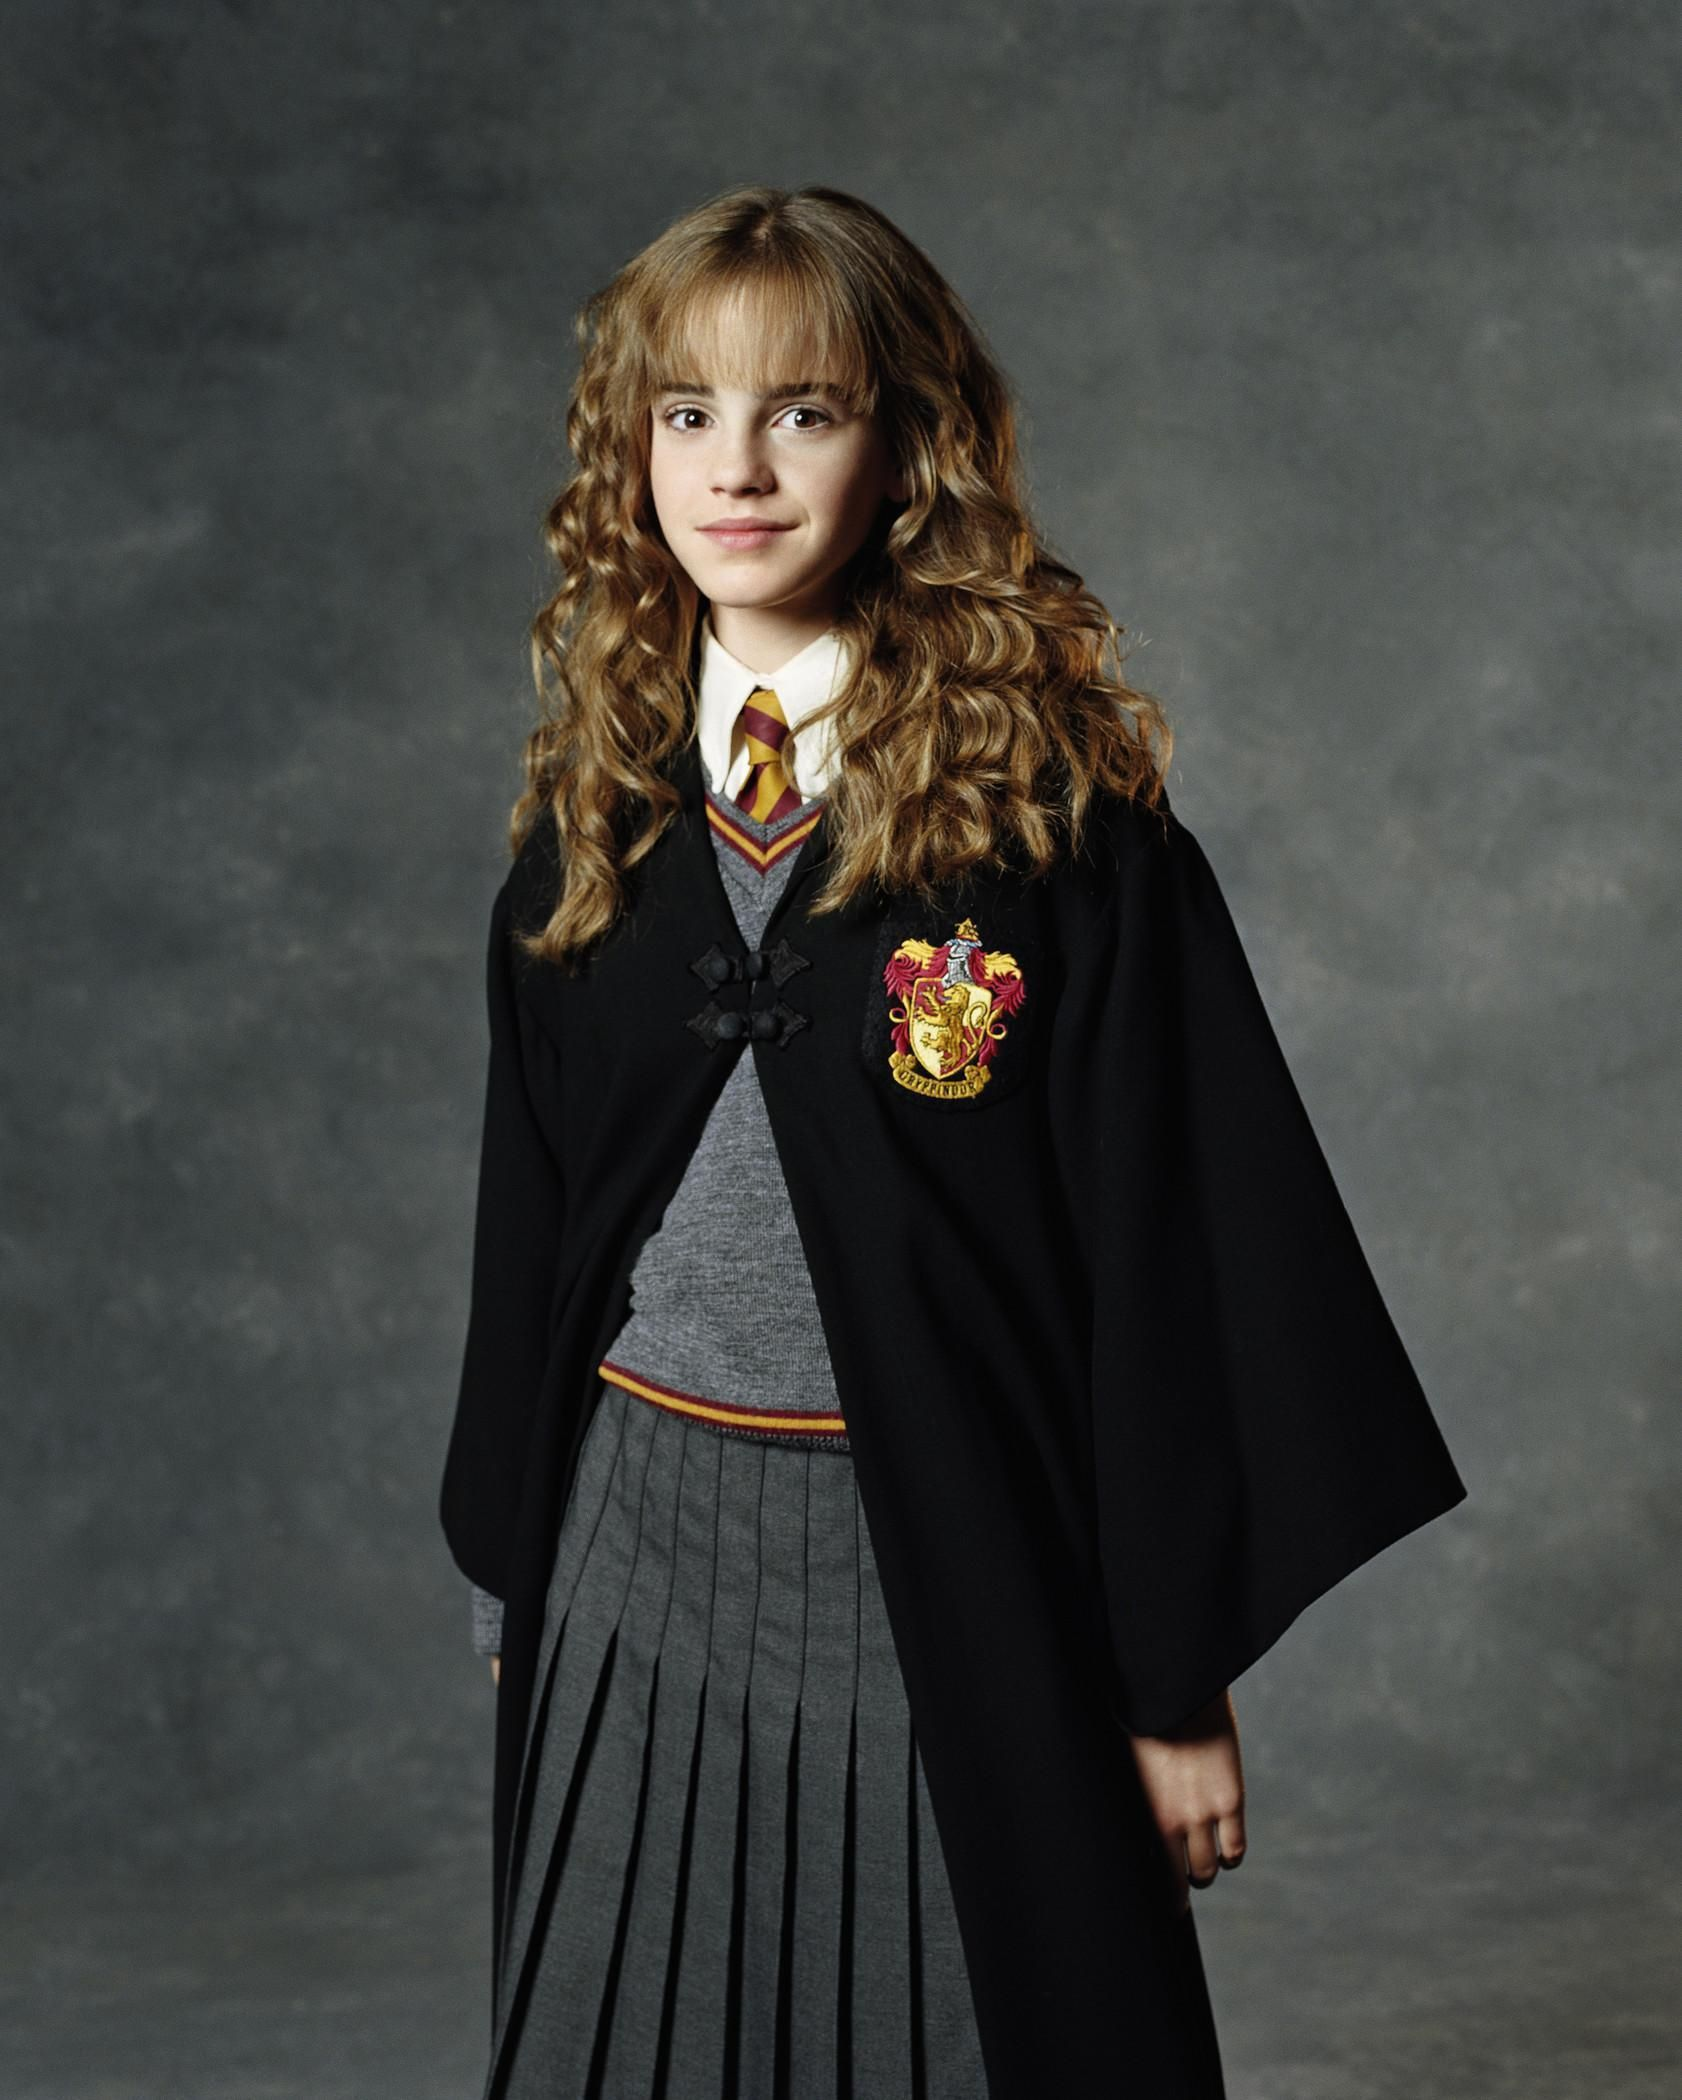 Pin von Harry Potter Hub auf The Brightest Witch of Her Age ...